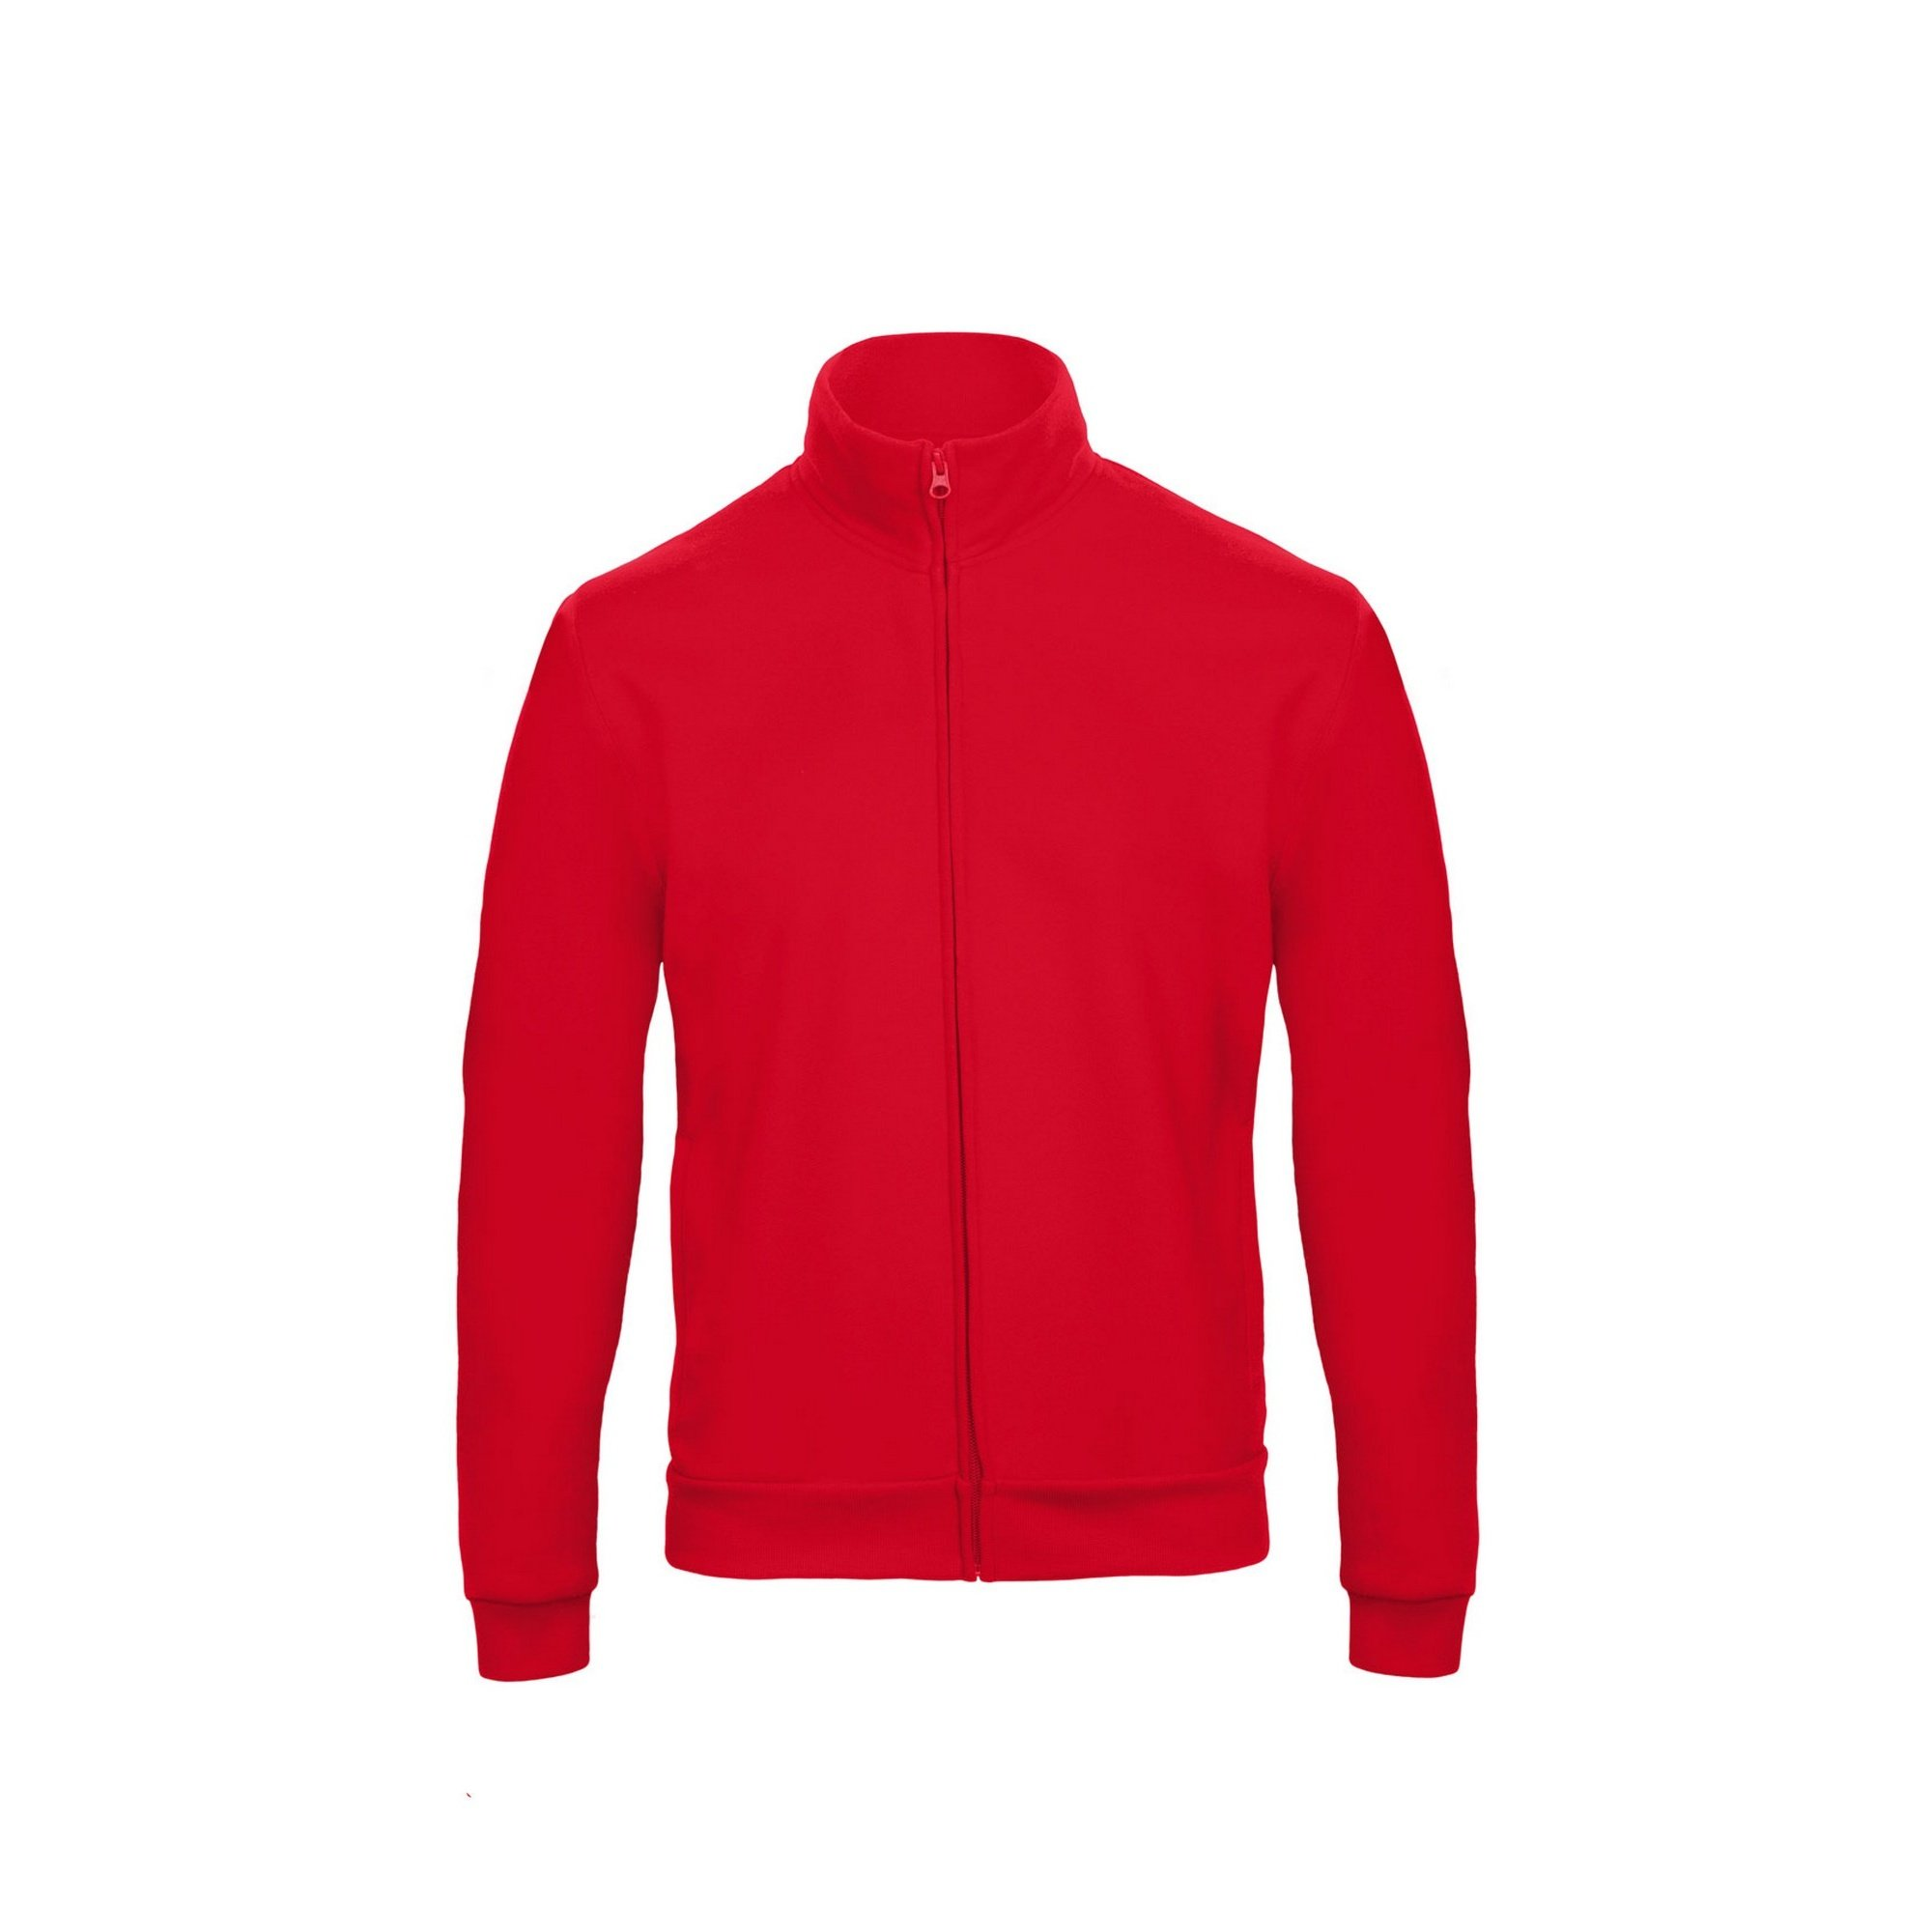 B&C Adults Unisex ID.206 50/50 Full Zip Sweat Jacket (M) (Red)